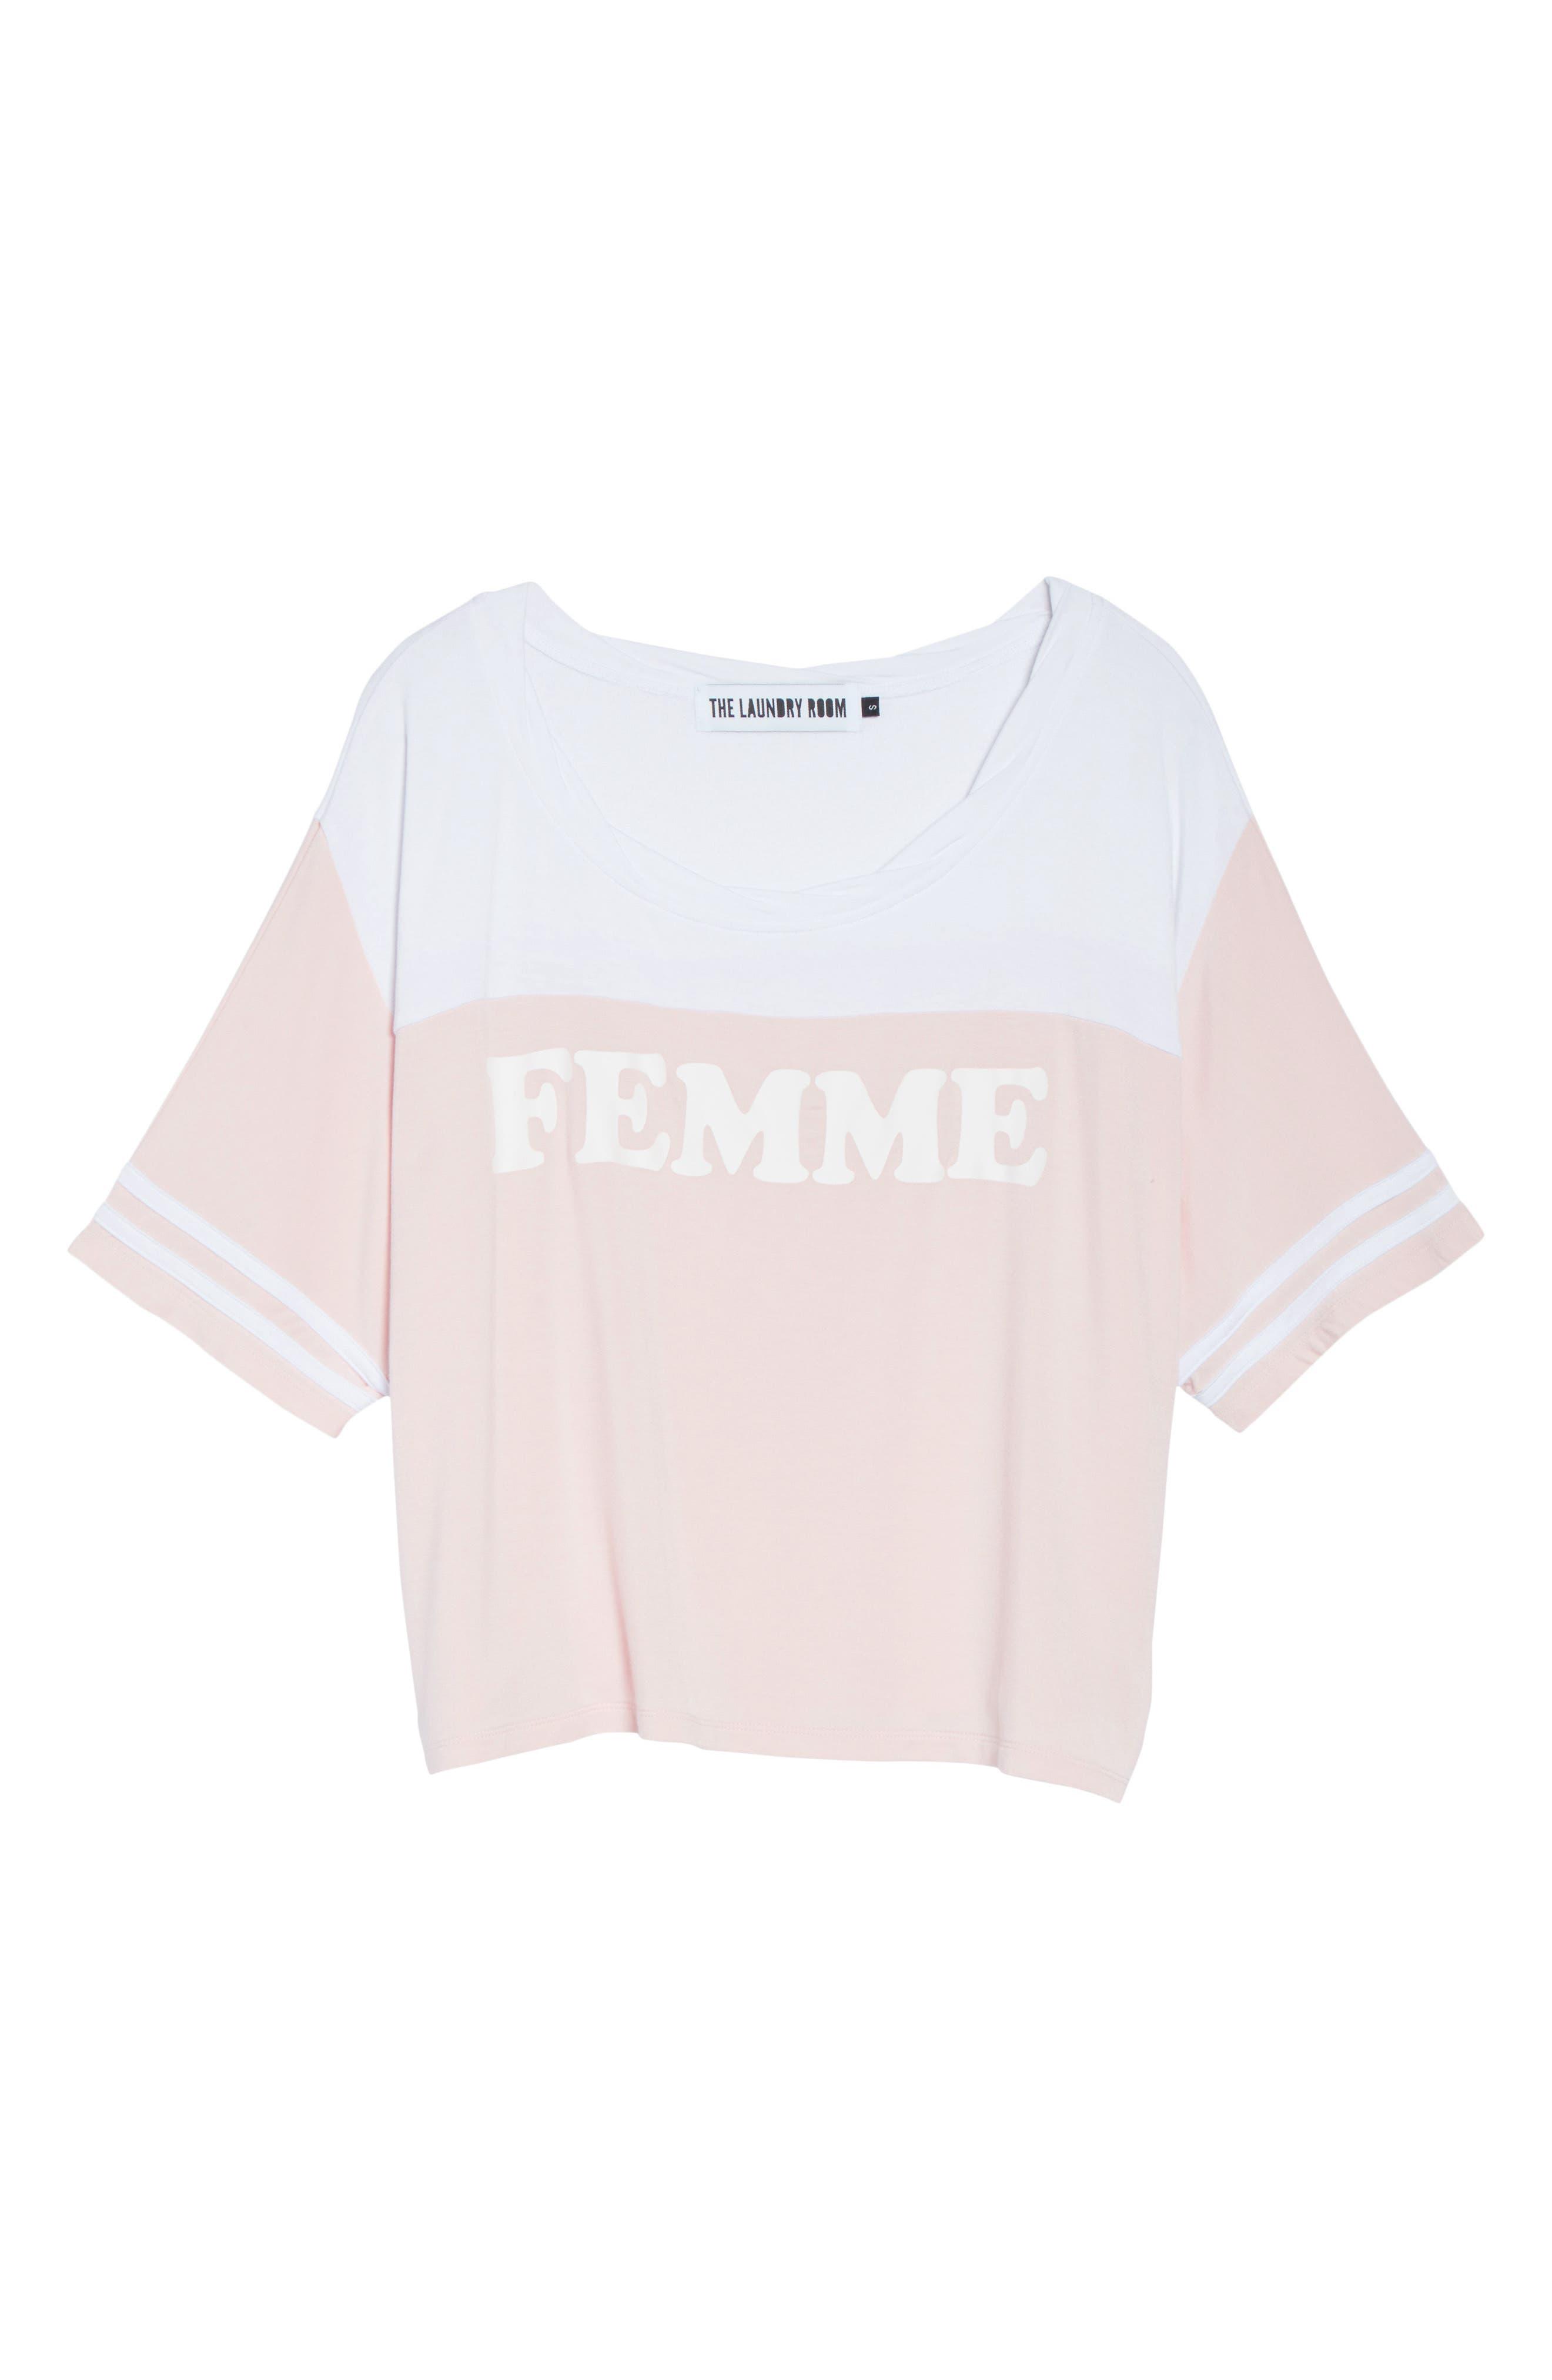 Team Femme Baggy Tee,                             Alternate thumbnail 6, color,                             693